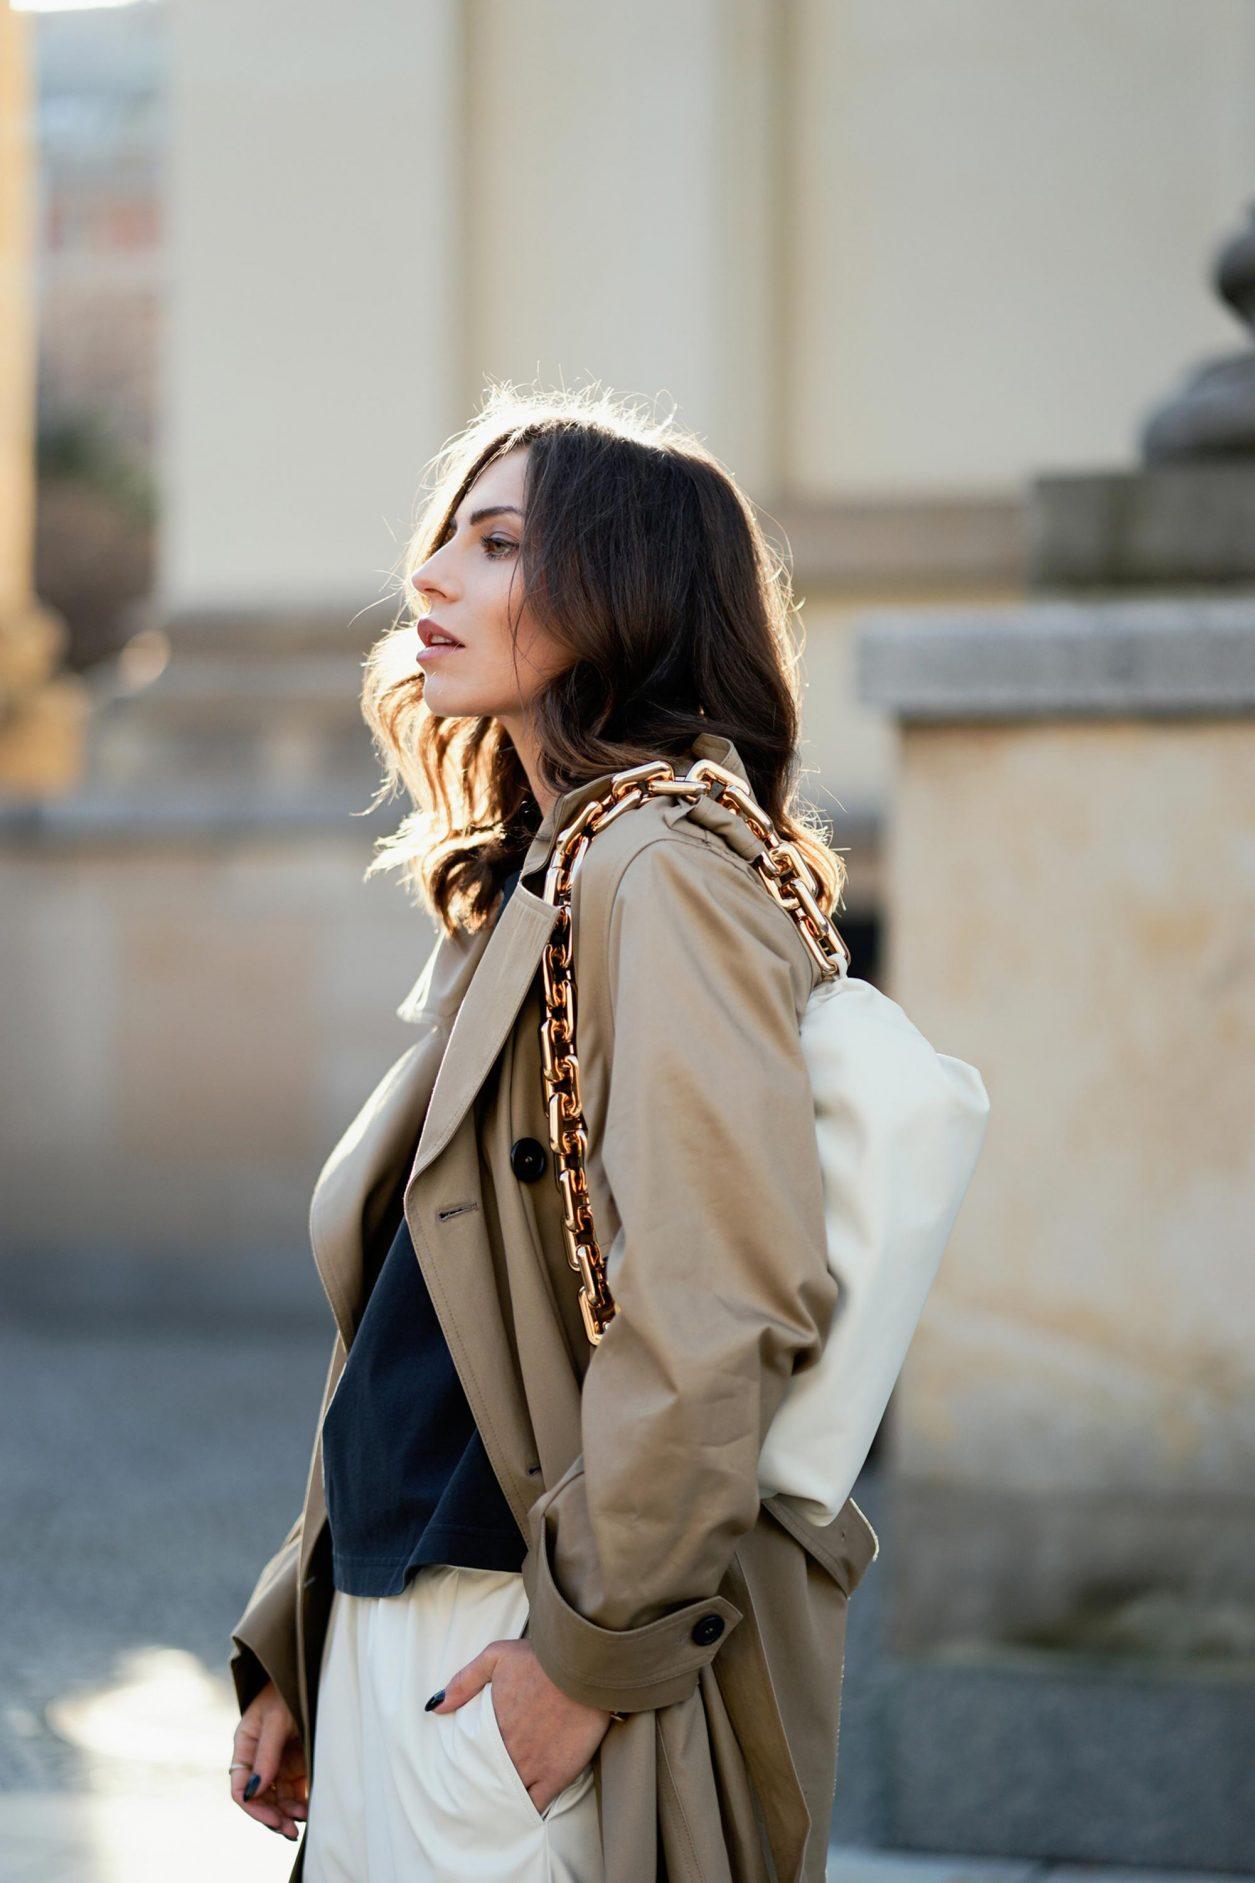 Portrait by Masha Sedgwick | Fashion blogger from Berlin, Germany | Spring outfit inspiration: wearing beige Saint Laurent trench coat, white Maison Margiela pants, the white Bottega Venetta chain pouch